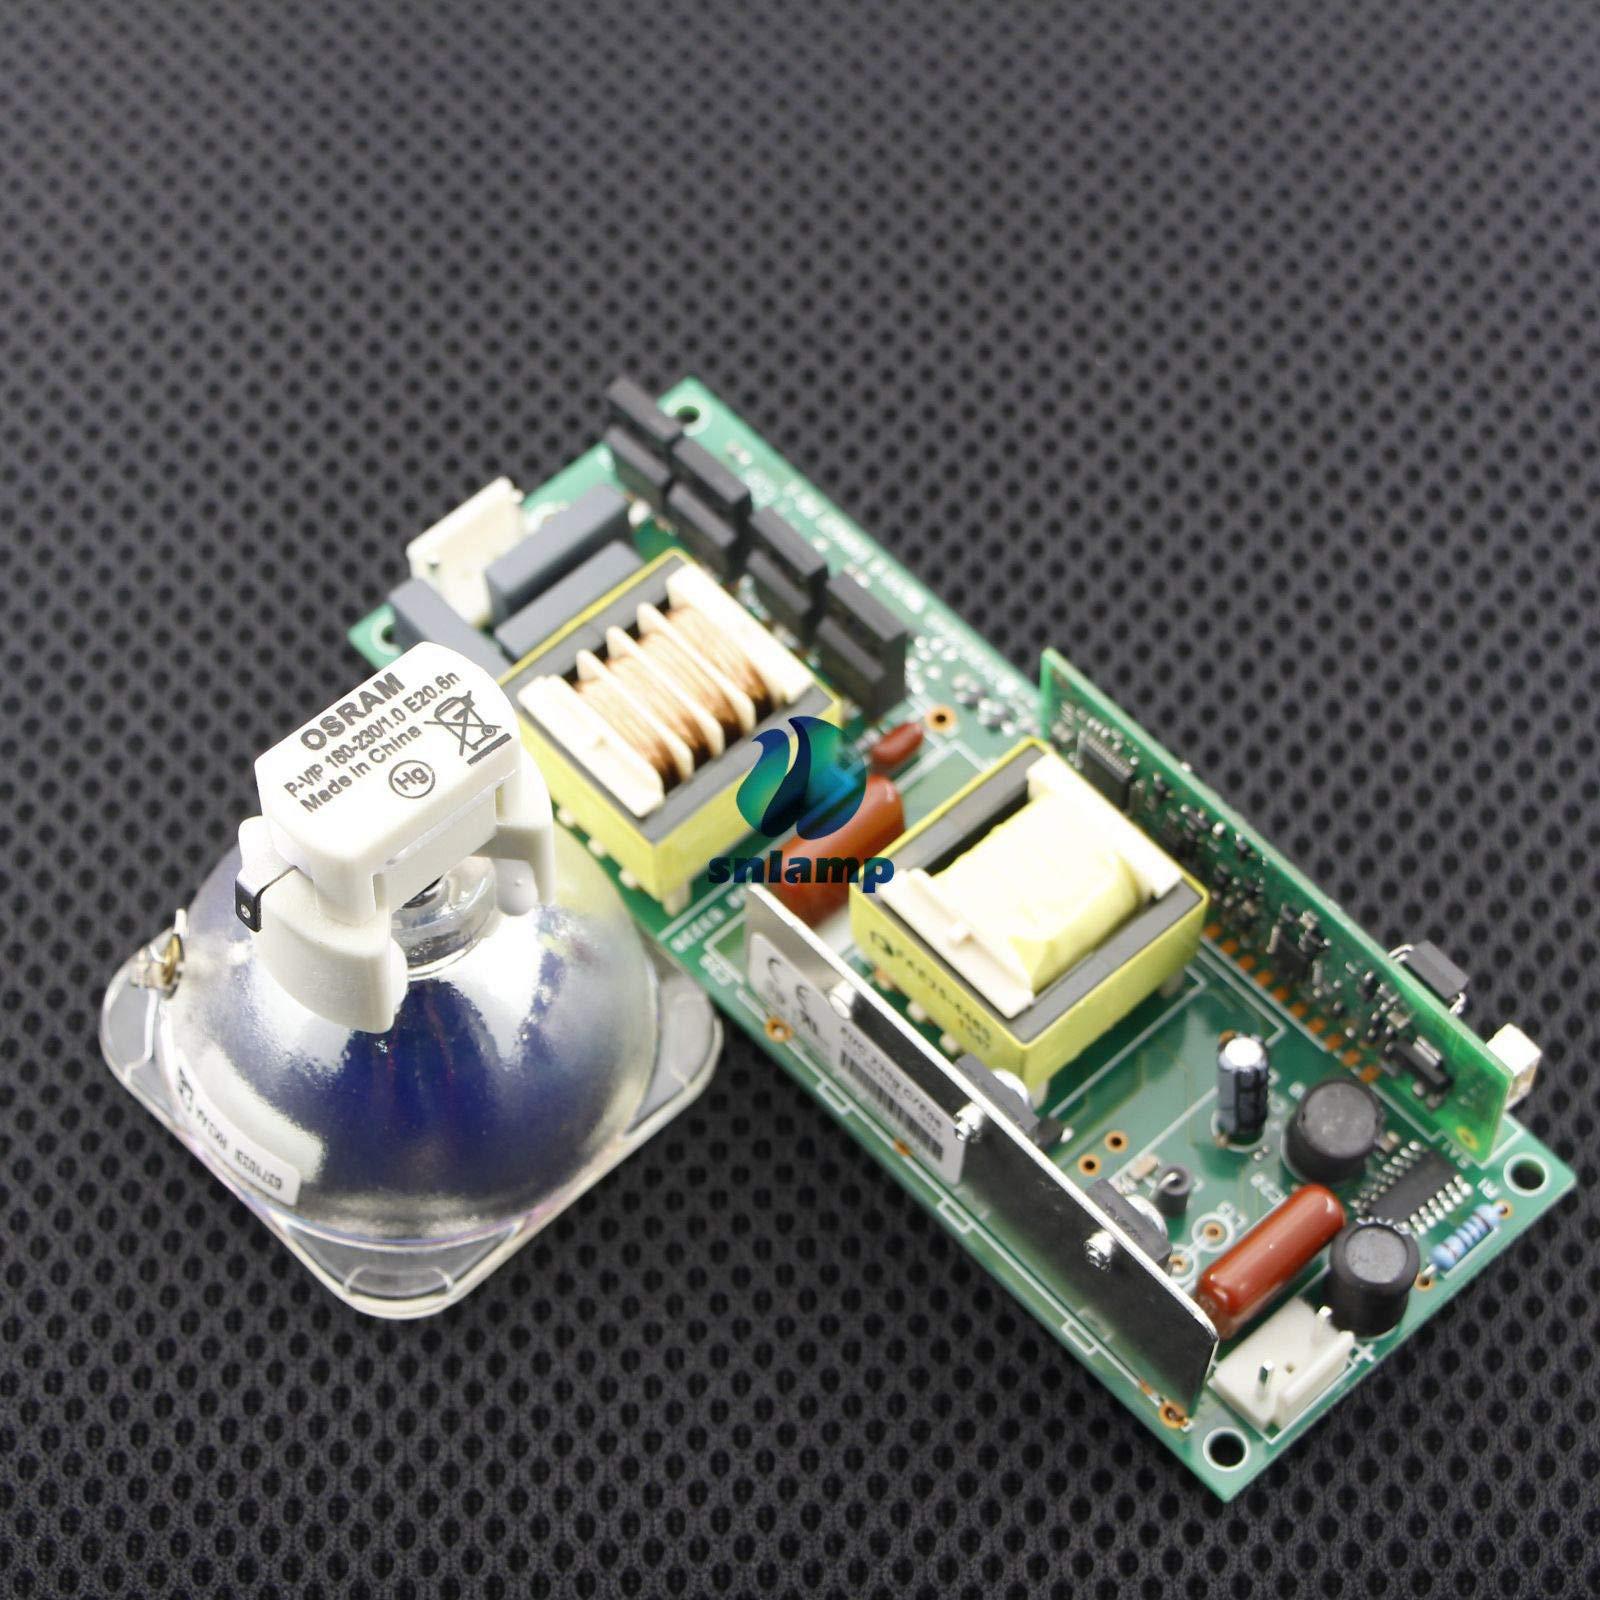 FidgetFidget 7R 230W Beam Light Bulb with Ballast Power Supply for R7 MSD Stage Lighting Lamp